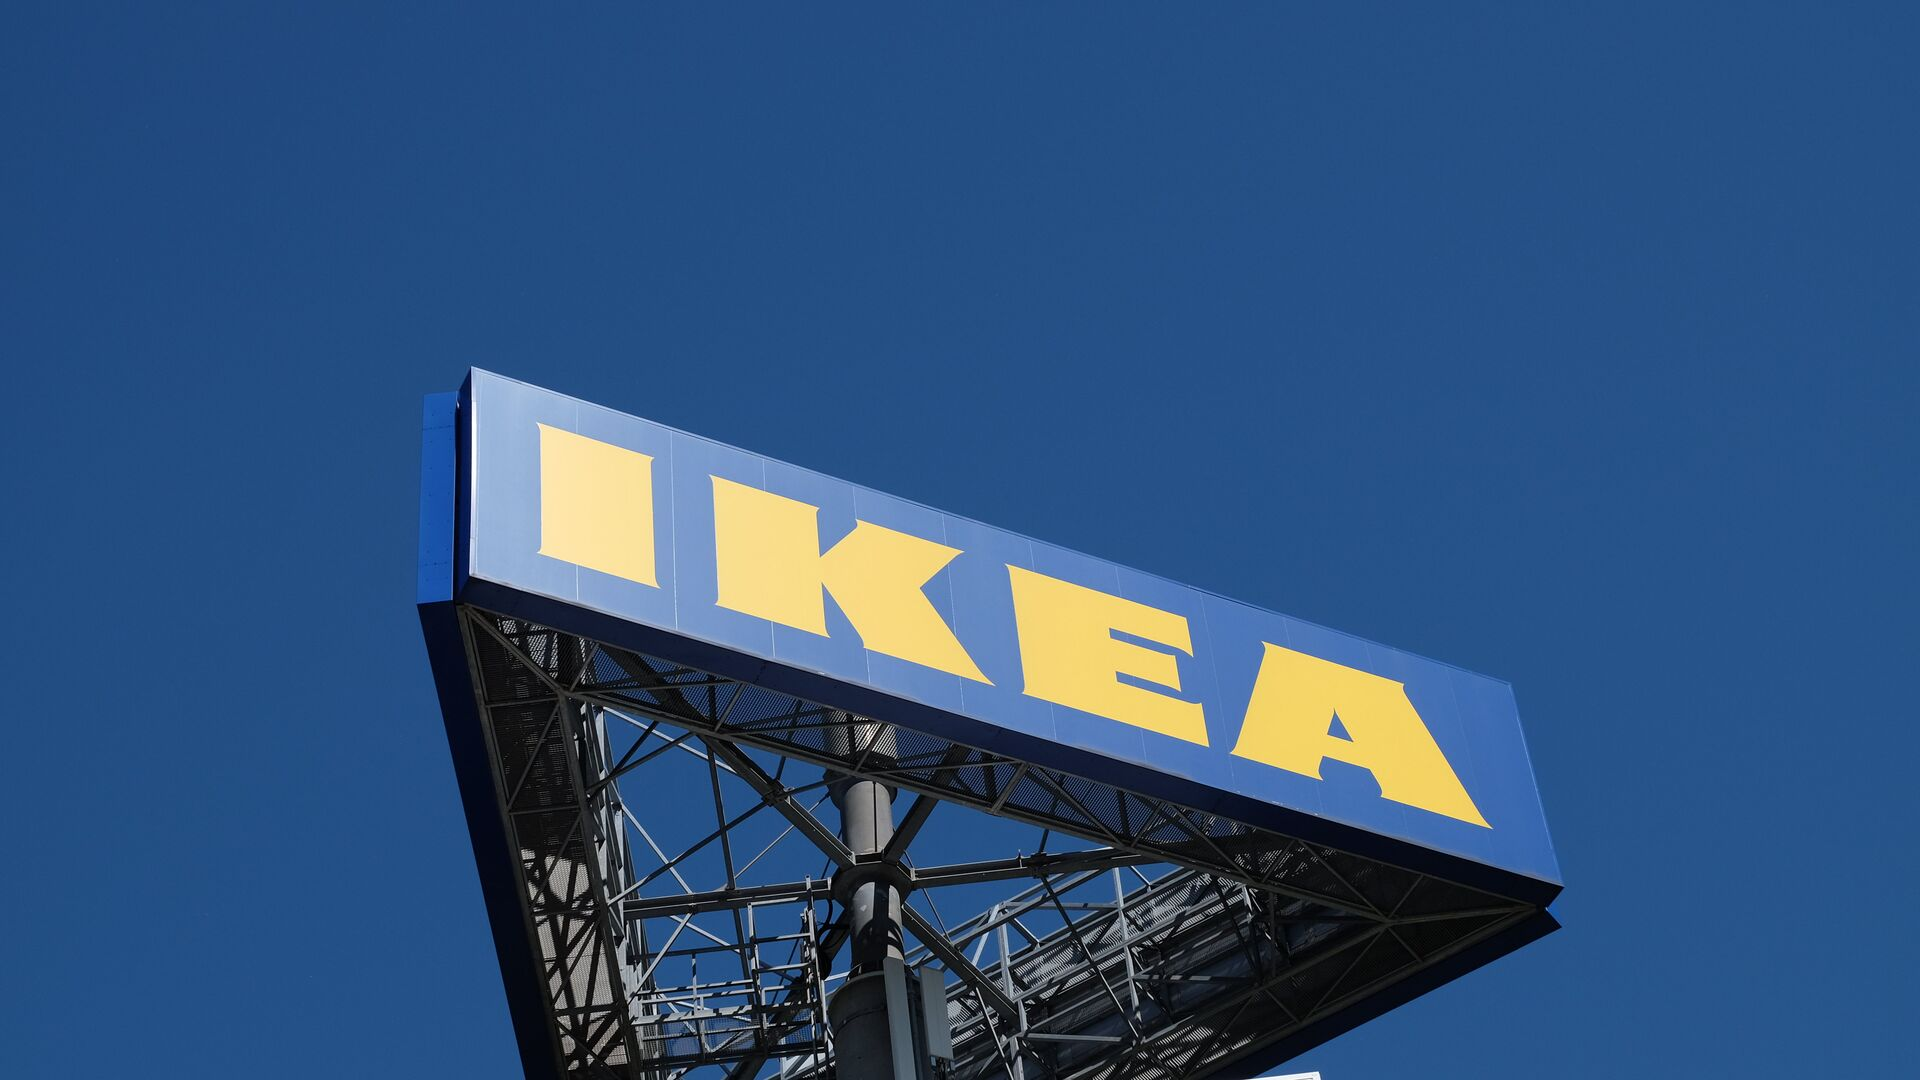 Logo de IKEA - Sputnik Mundo, 1920, 05.03.2021